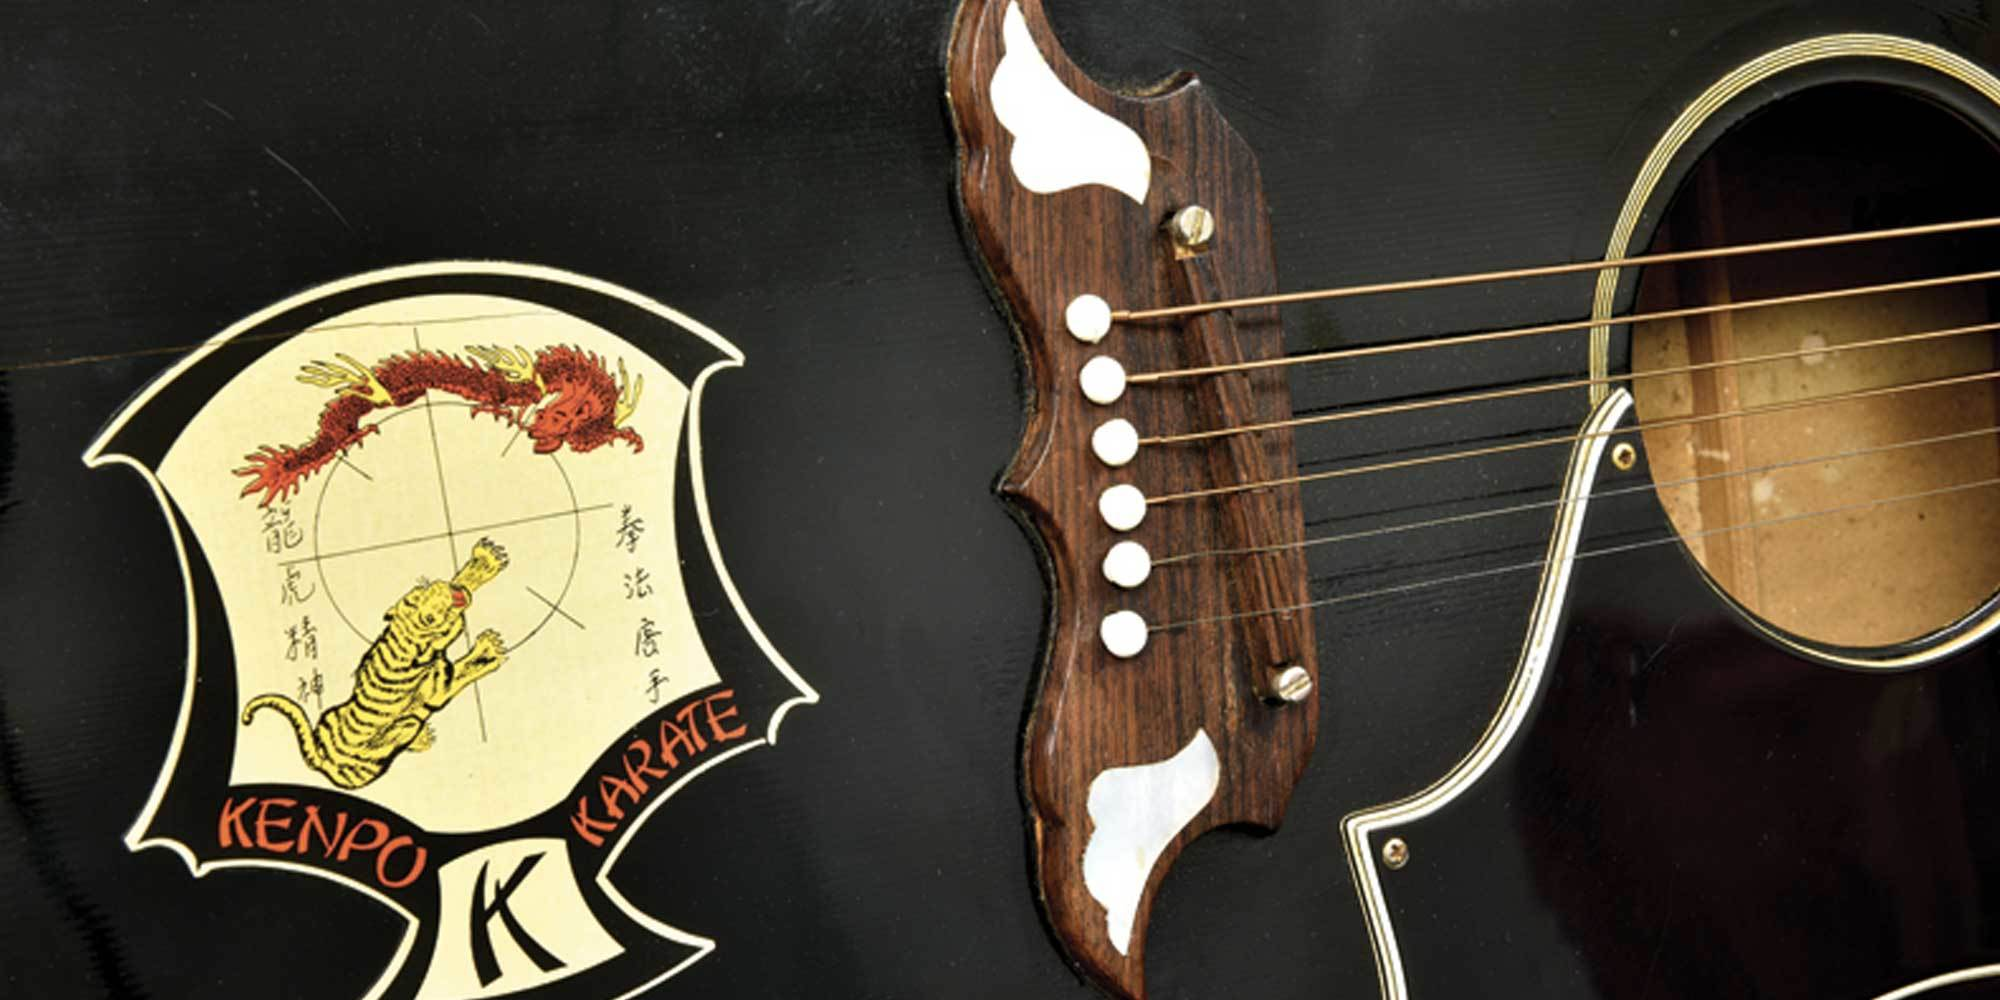 Elvis Presley's Gibson Ebony Dove Fails to Sell | Reverb News